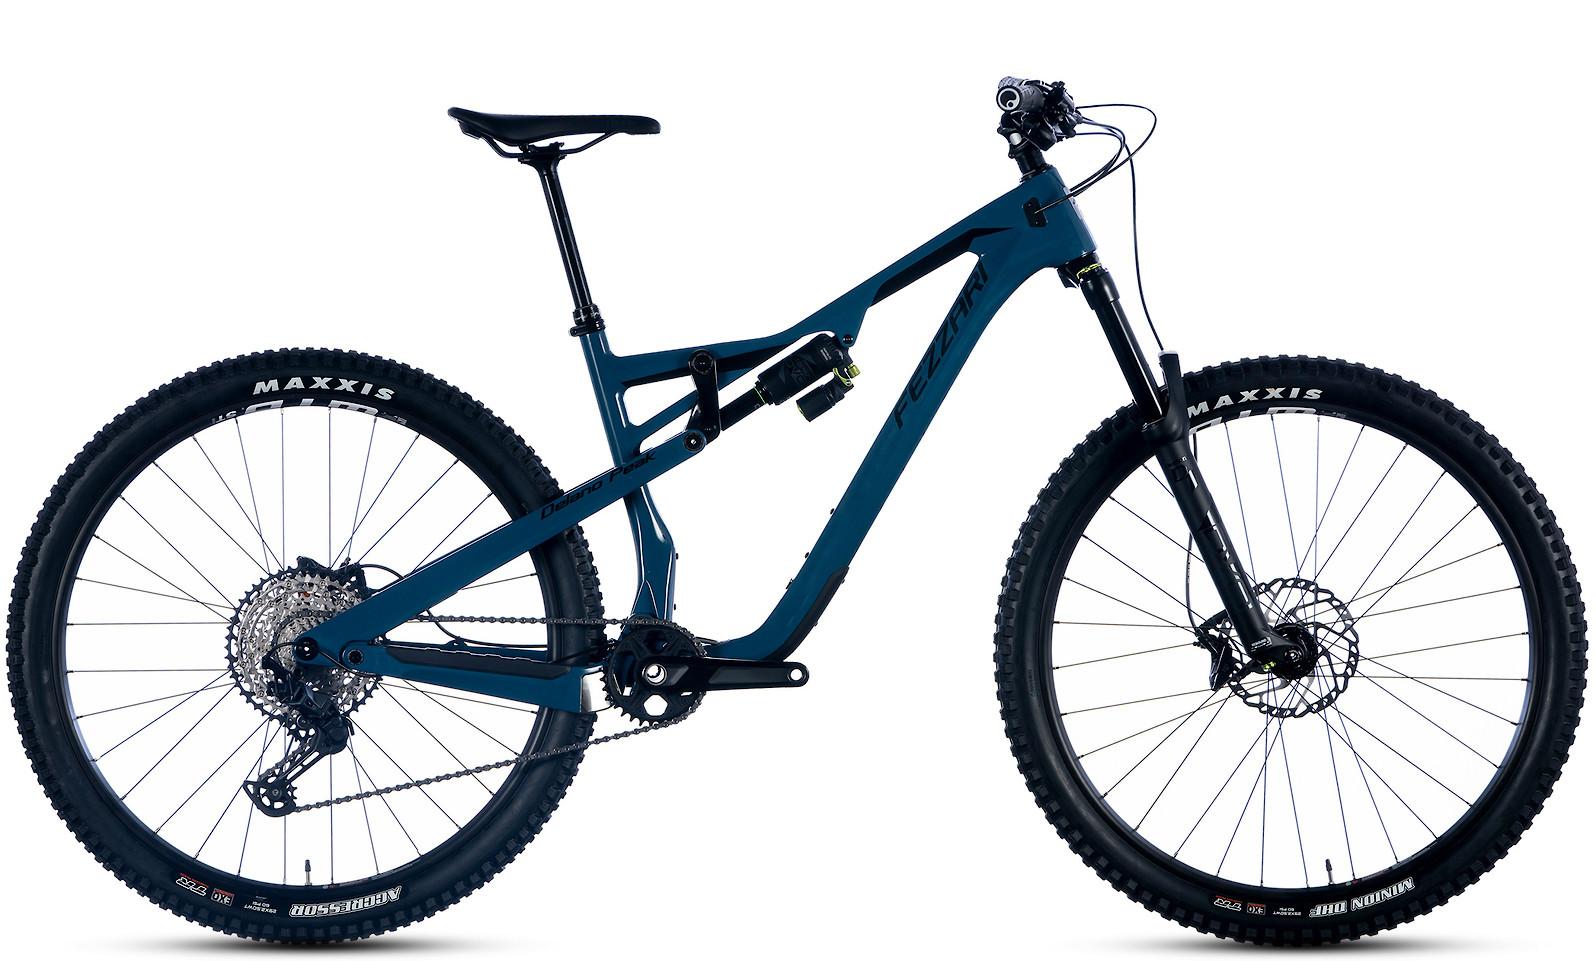 2020 Fezzari Delano Peak Comp (Blue)